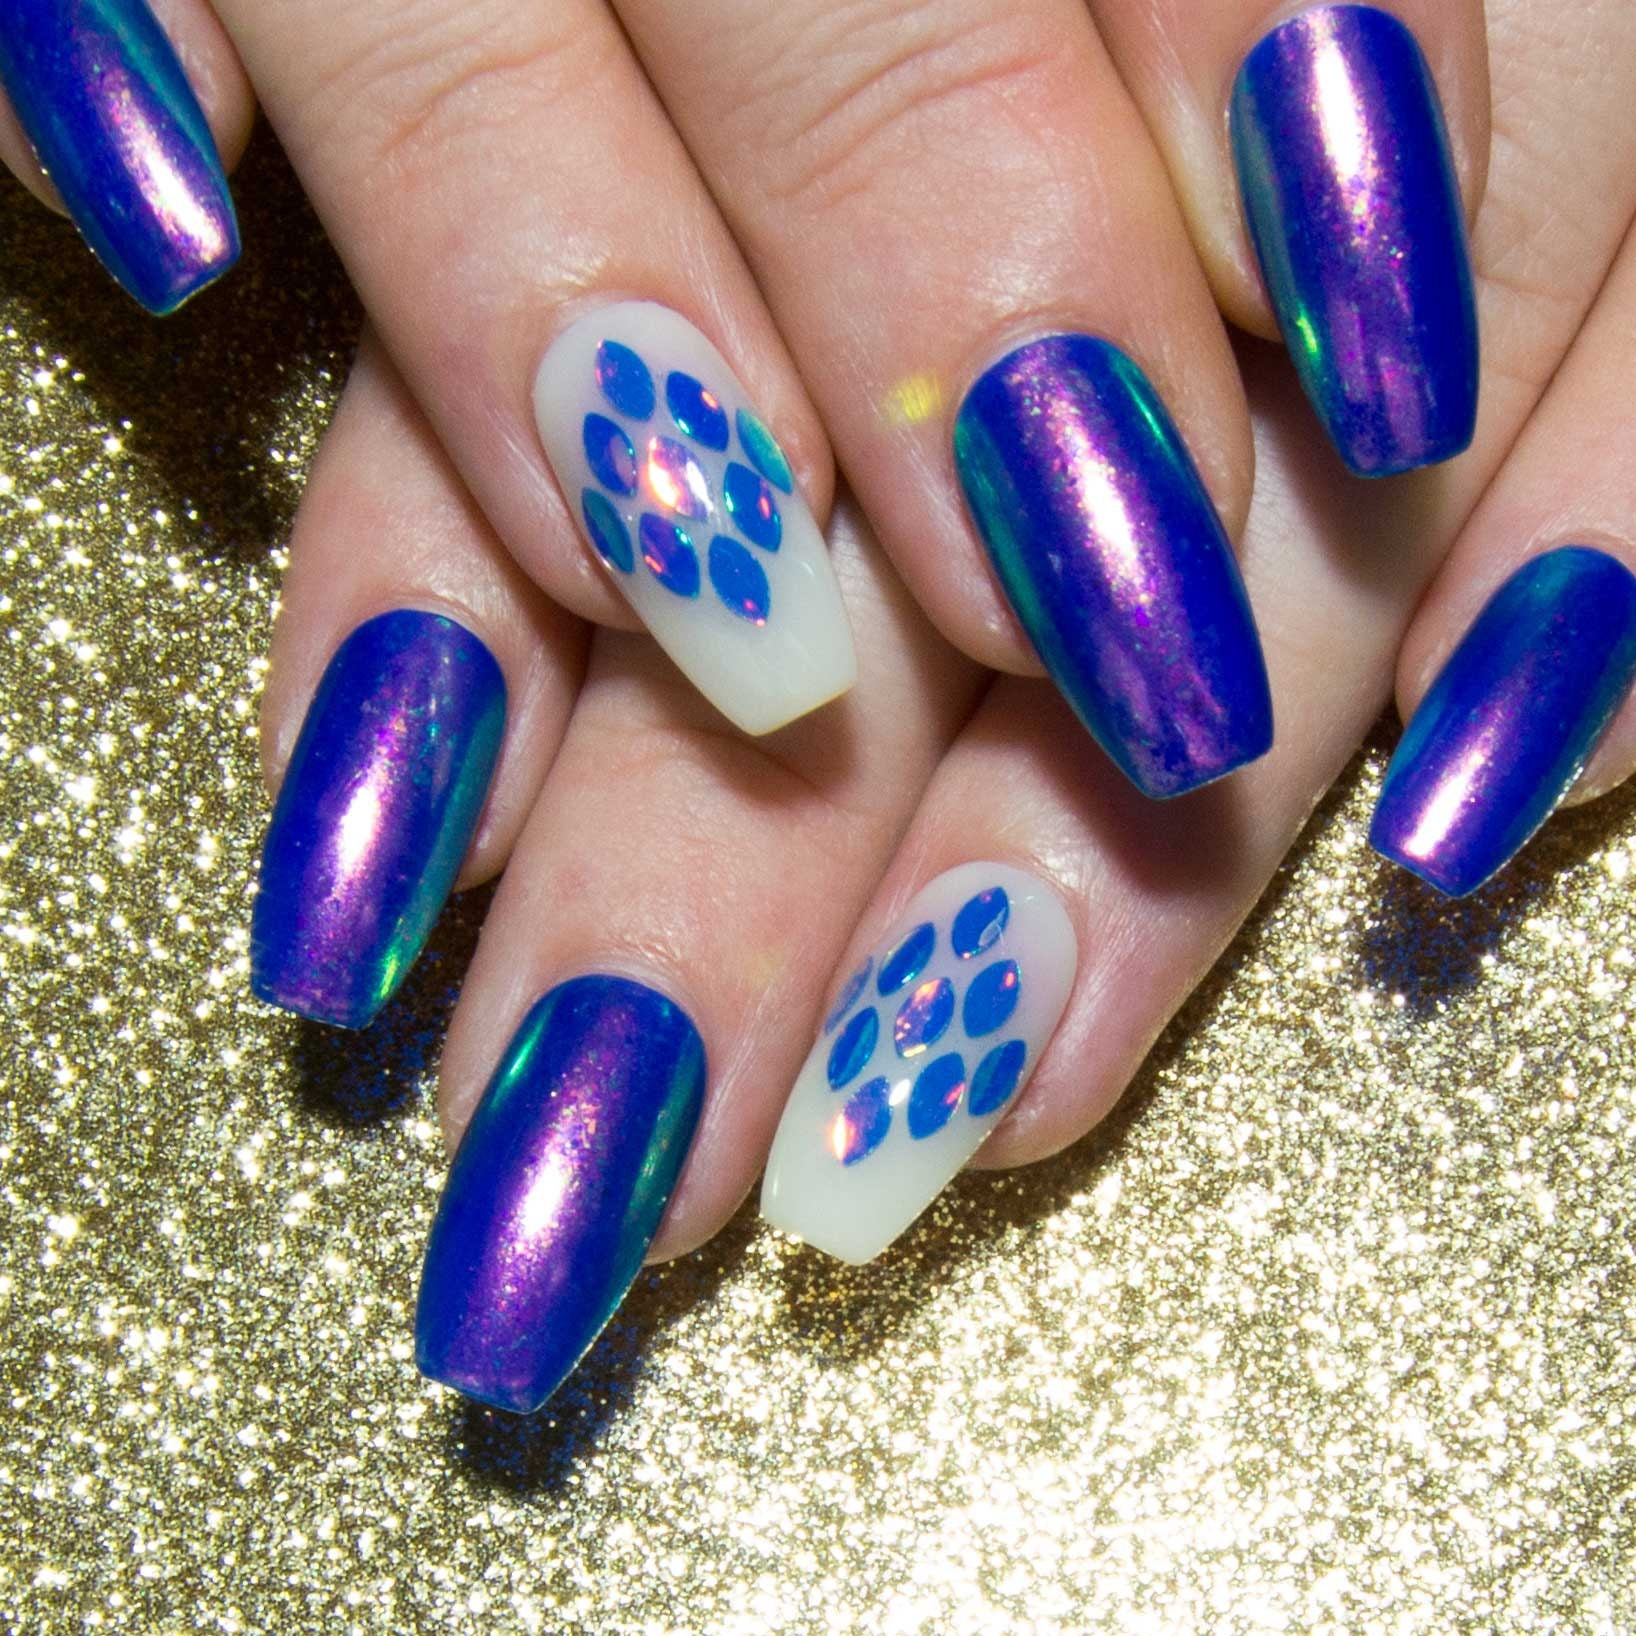 Iridescent Fake Nails - Press On Nails Blue - Unicorn Acrylic Nail ...